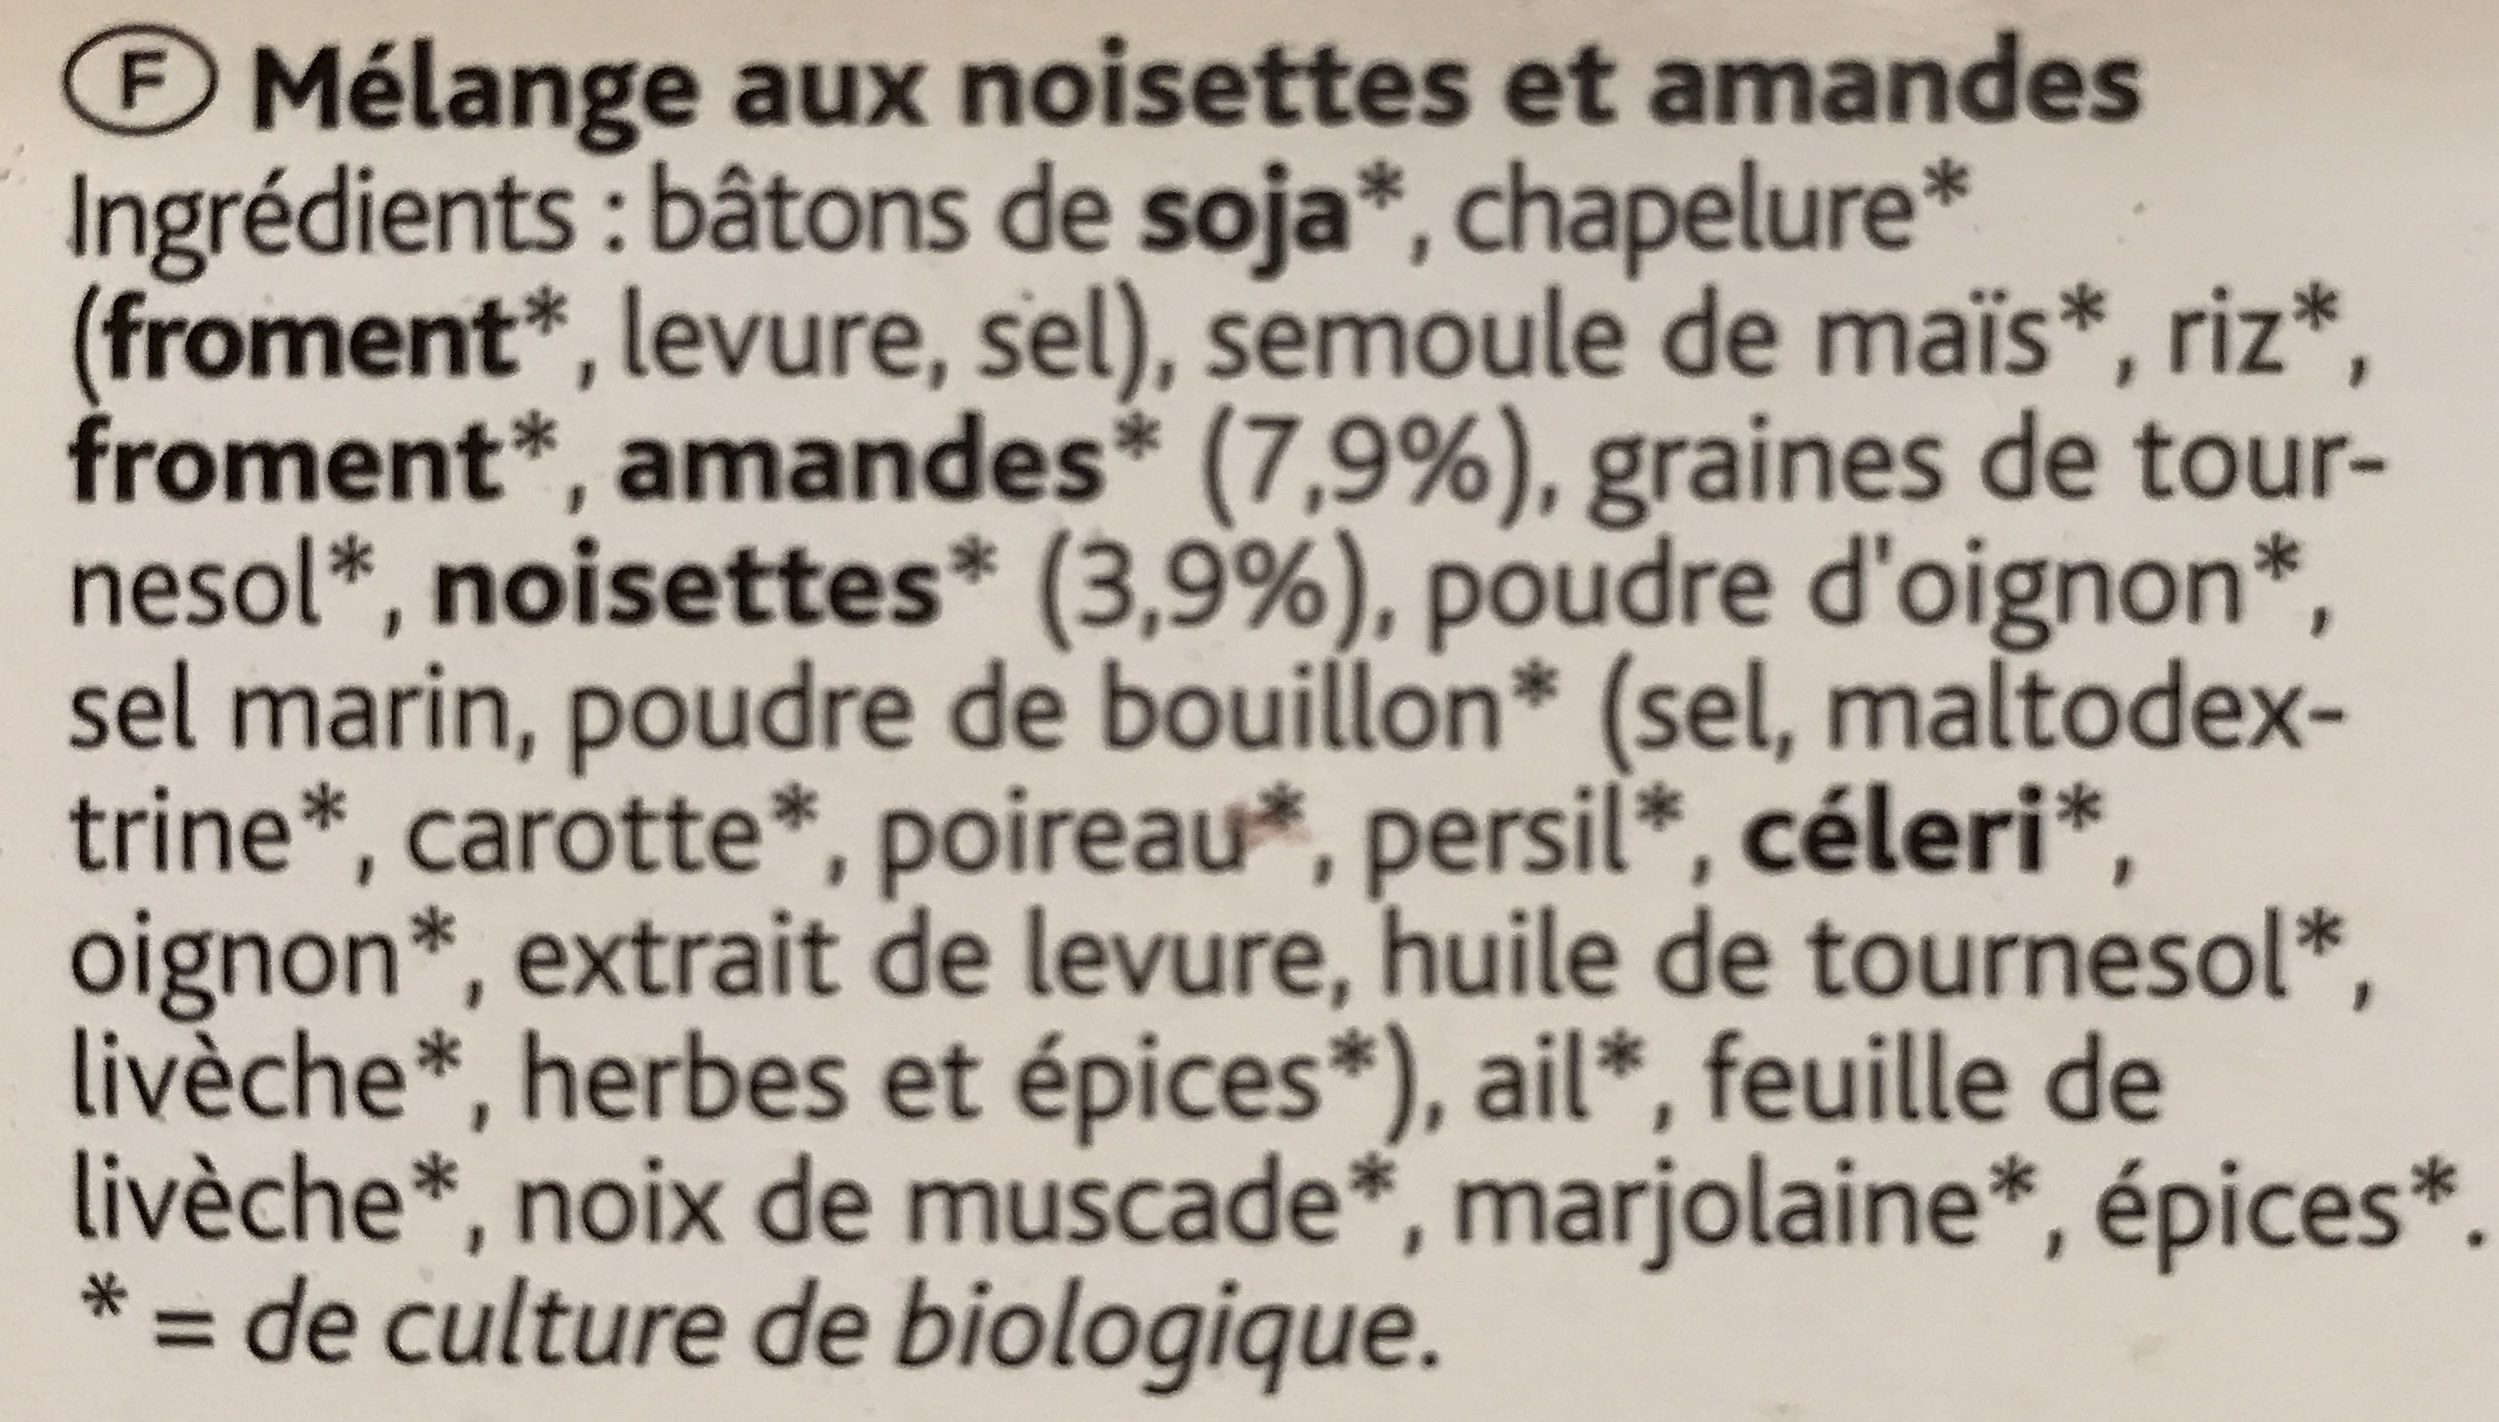 Bioburger Noisettes Amandes - Ingrediënten - fr